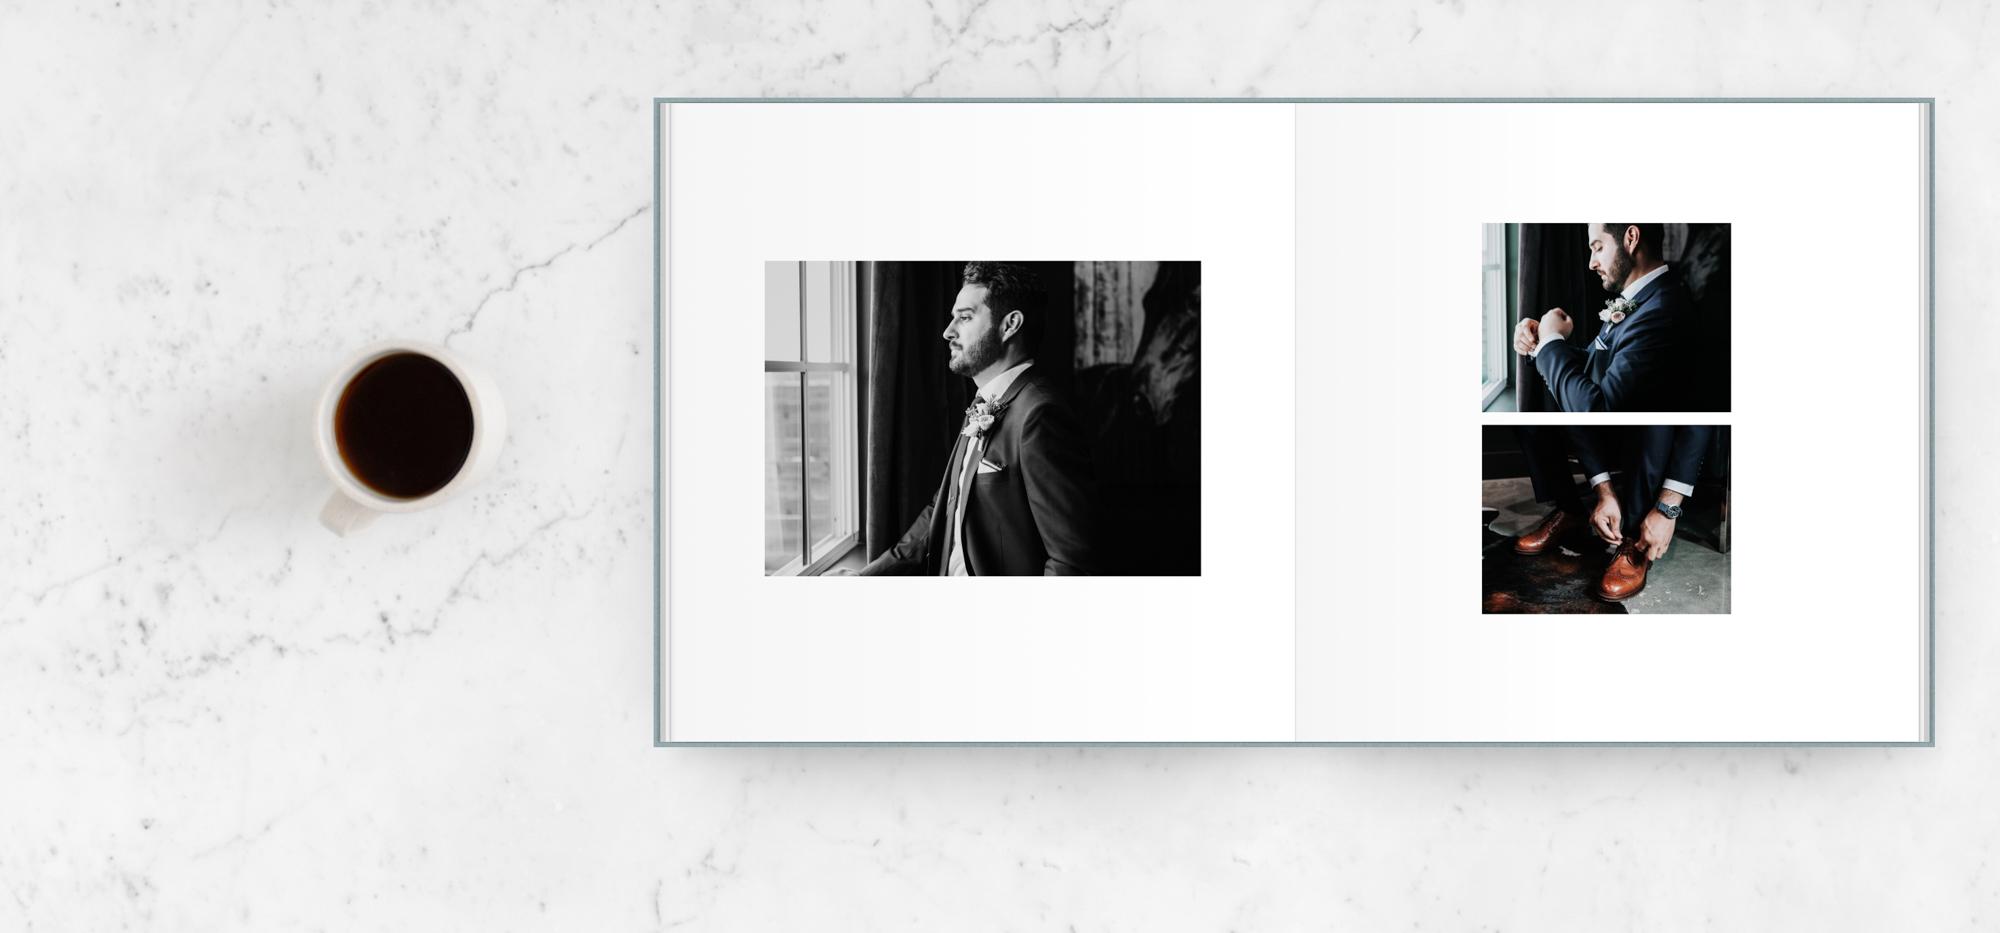 GivernyAlbumNatalieRafael_0005.jpg